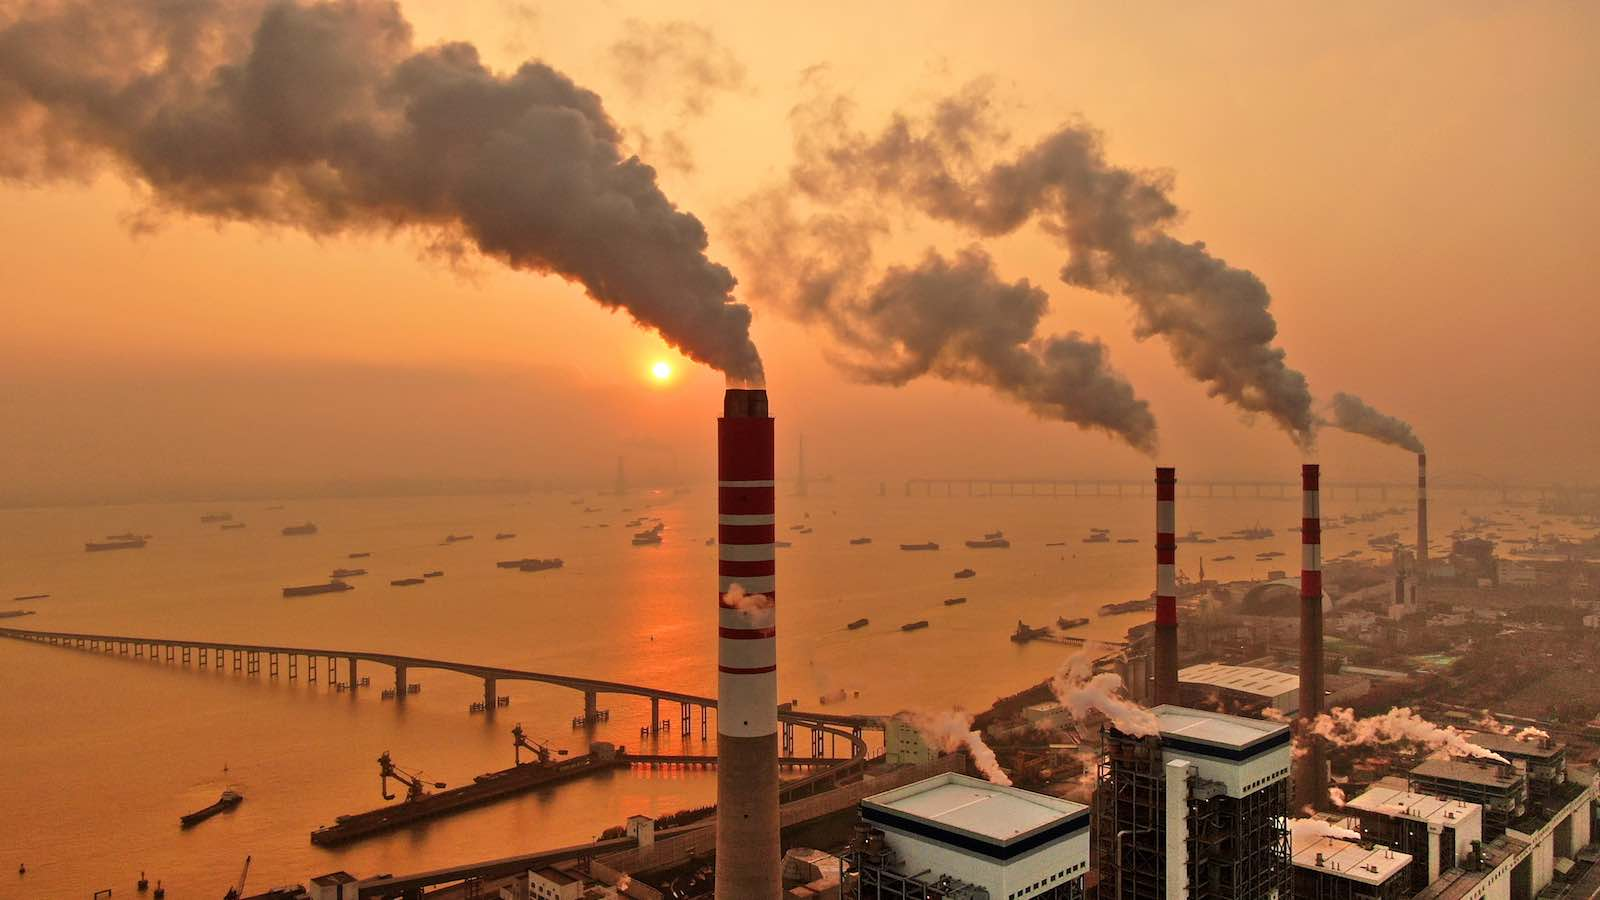 Nantong power station, a 3400-megawatt coal-fired power station in Jiangsu Province, China (Photo: Barcroft Media via Getty)